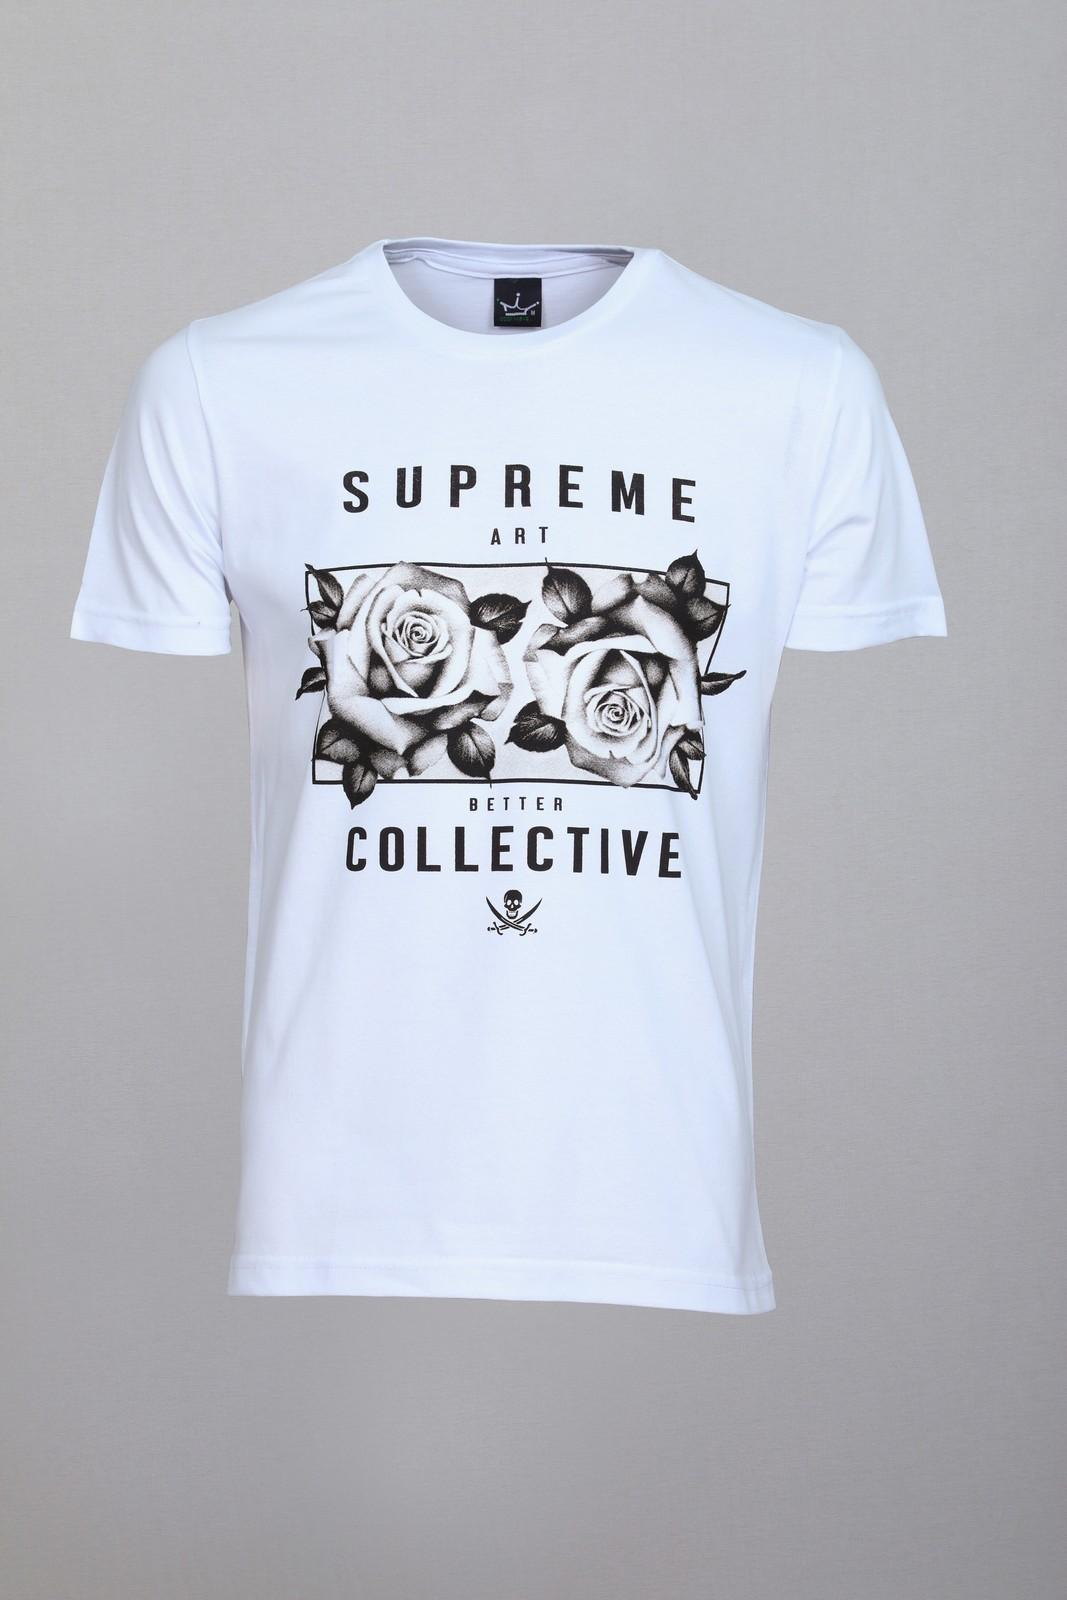 Camiseta CoolWave Supreme Collective Branca